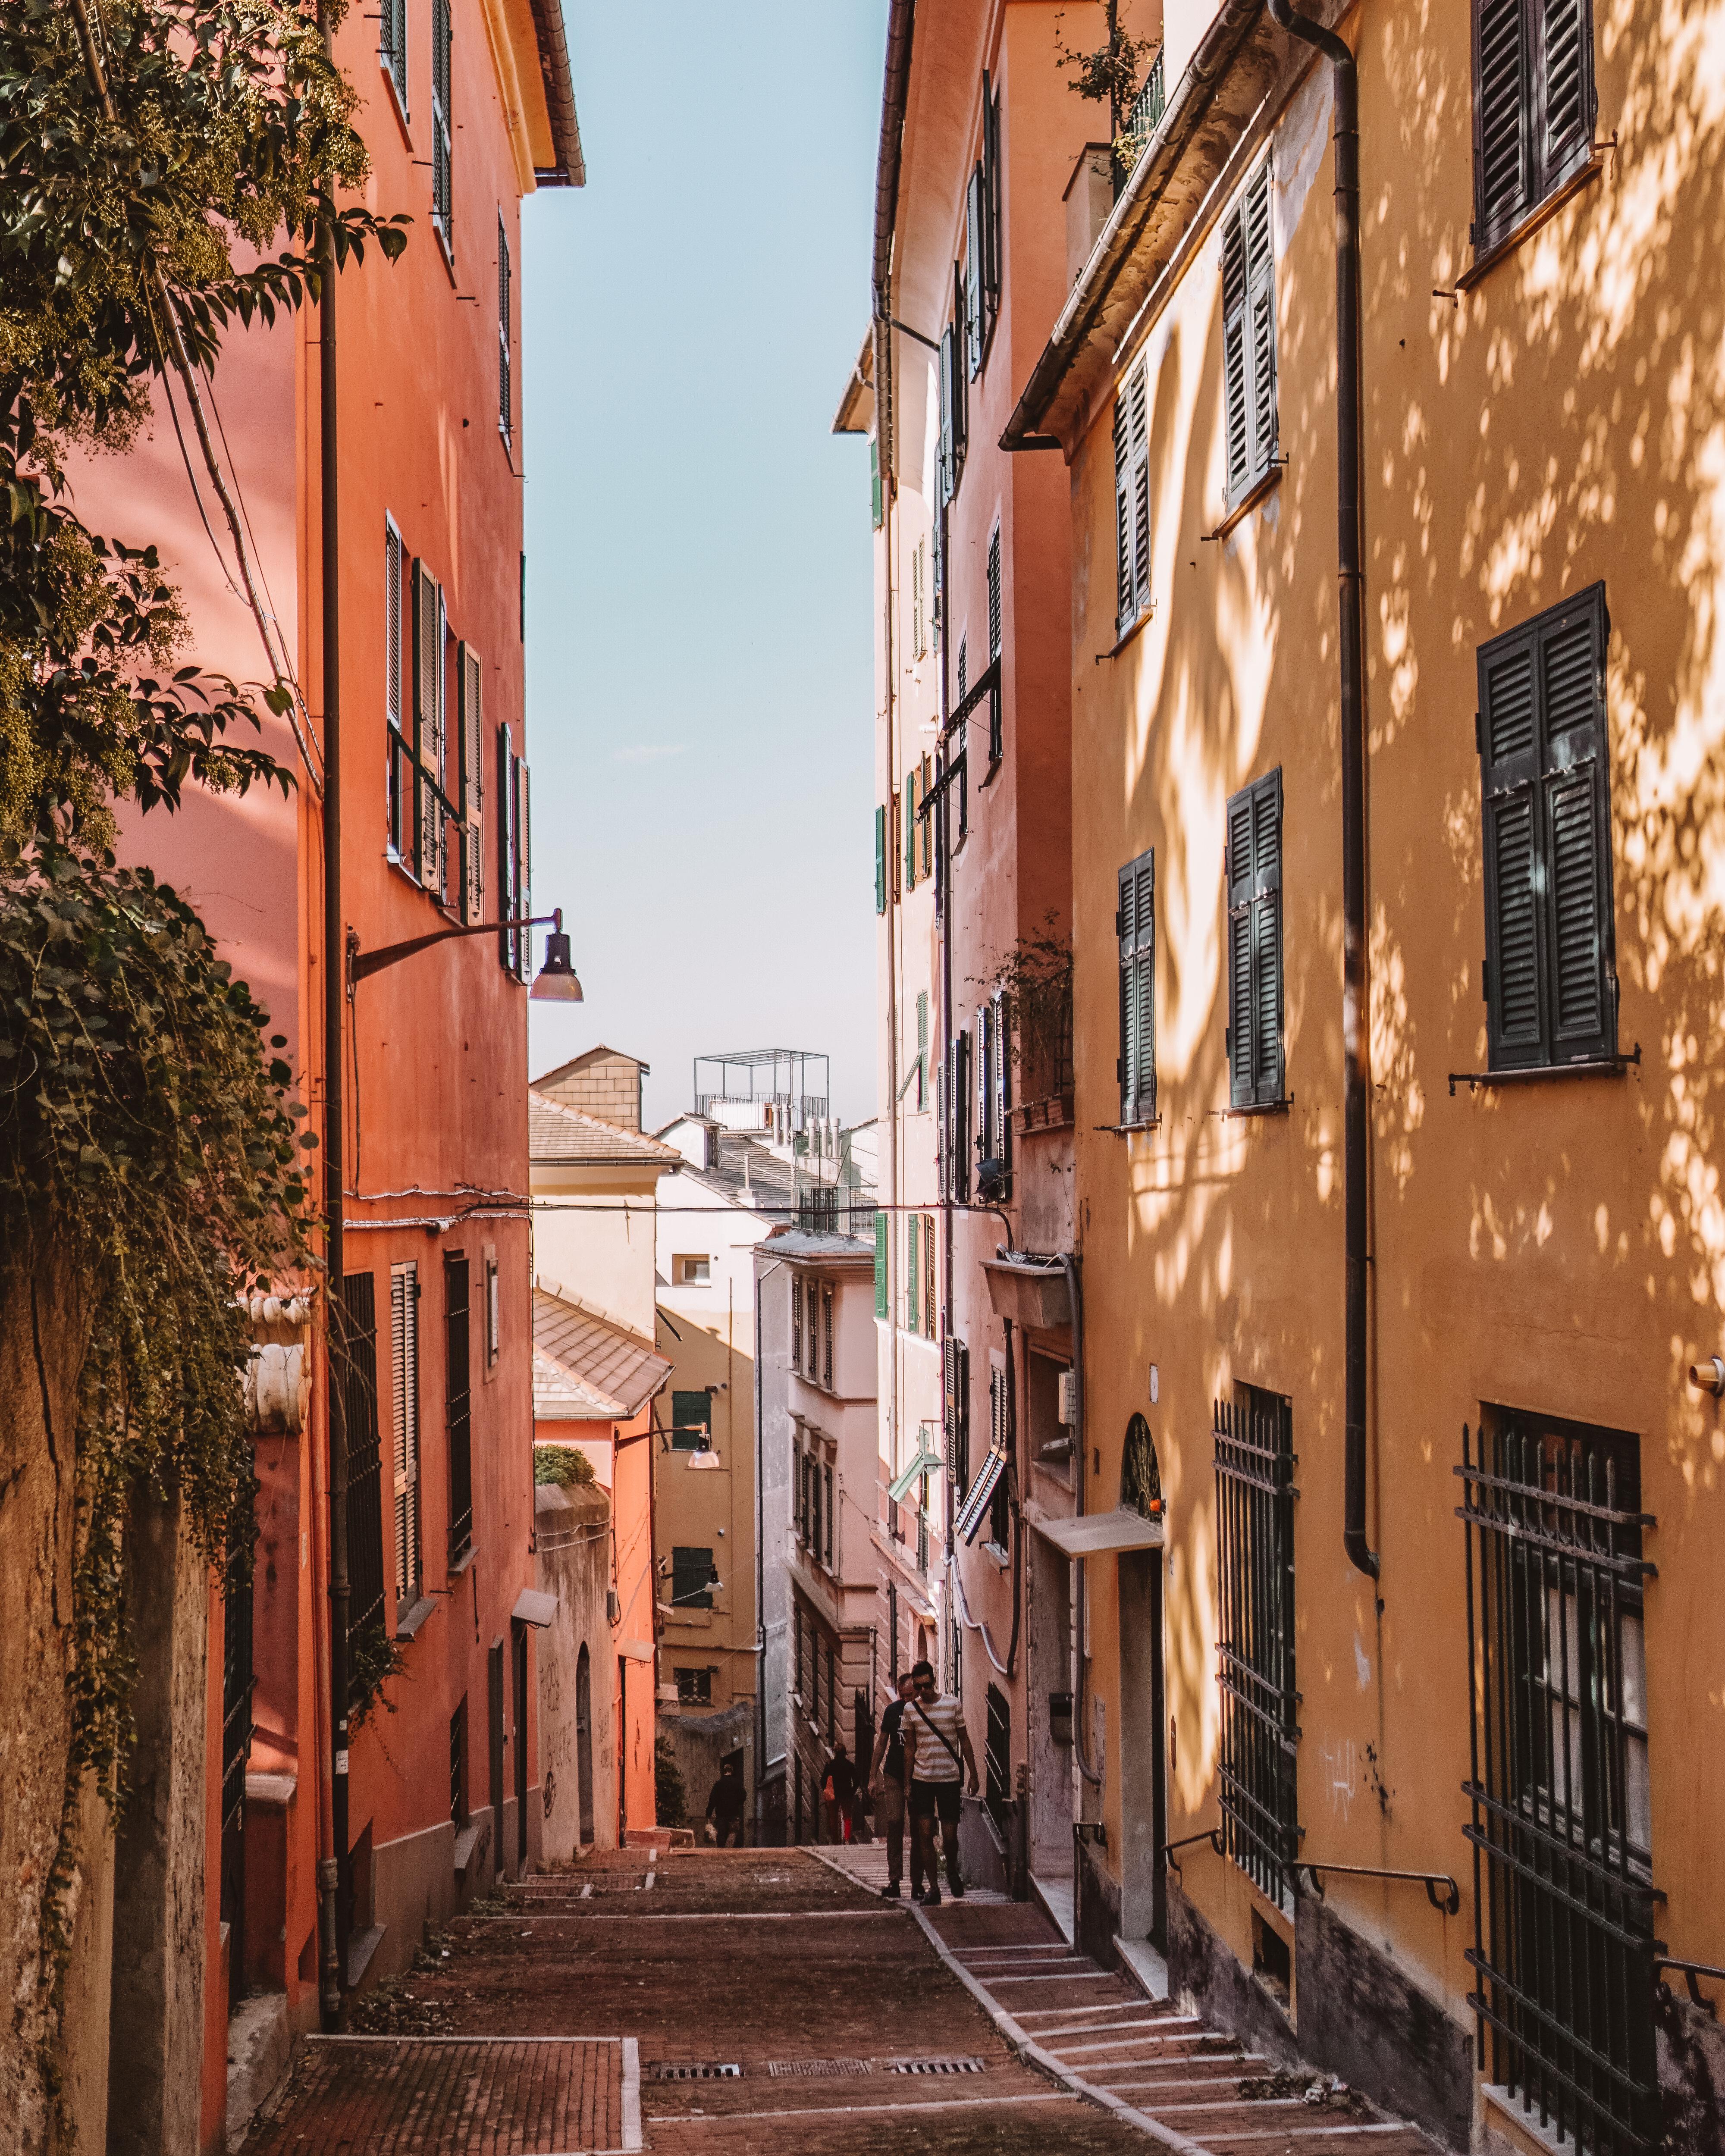 Walking through the streets of Genoa, Liguria